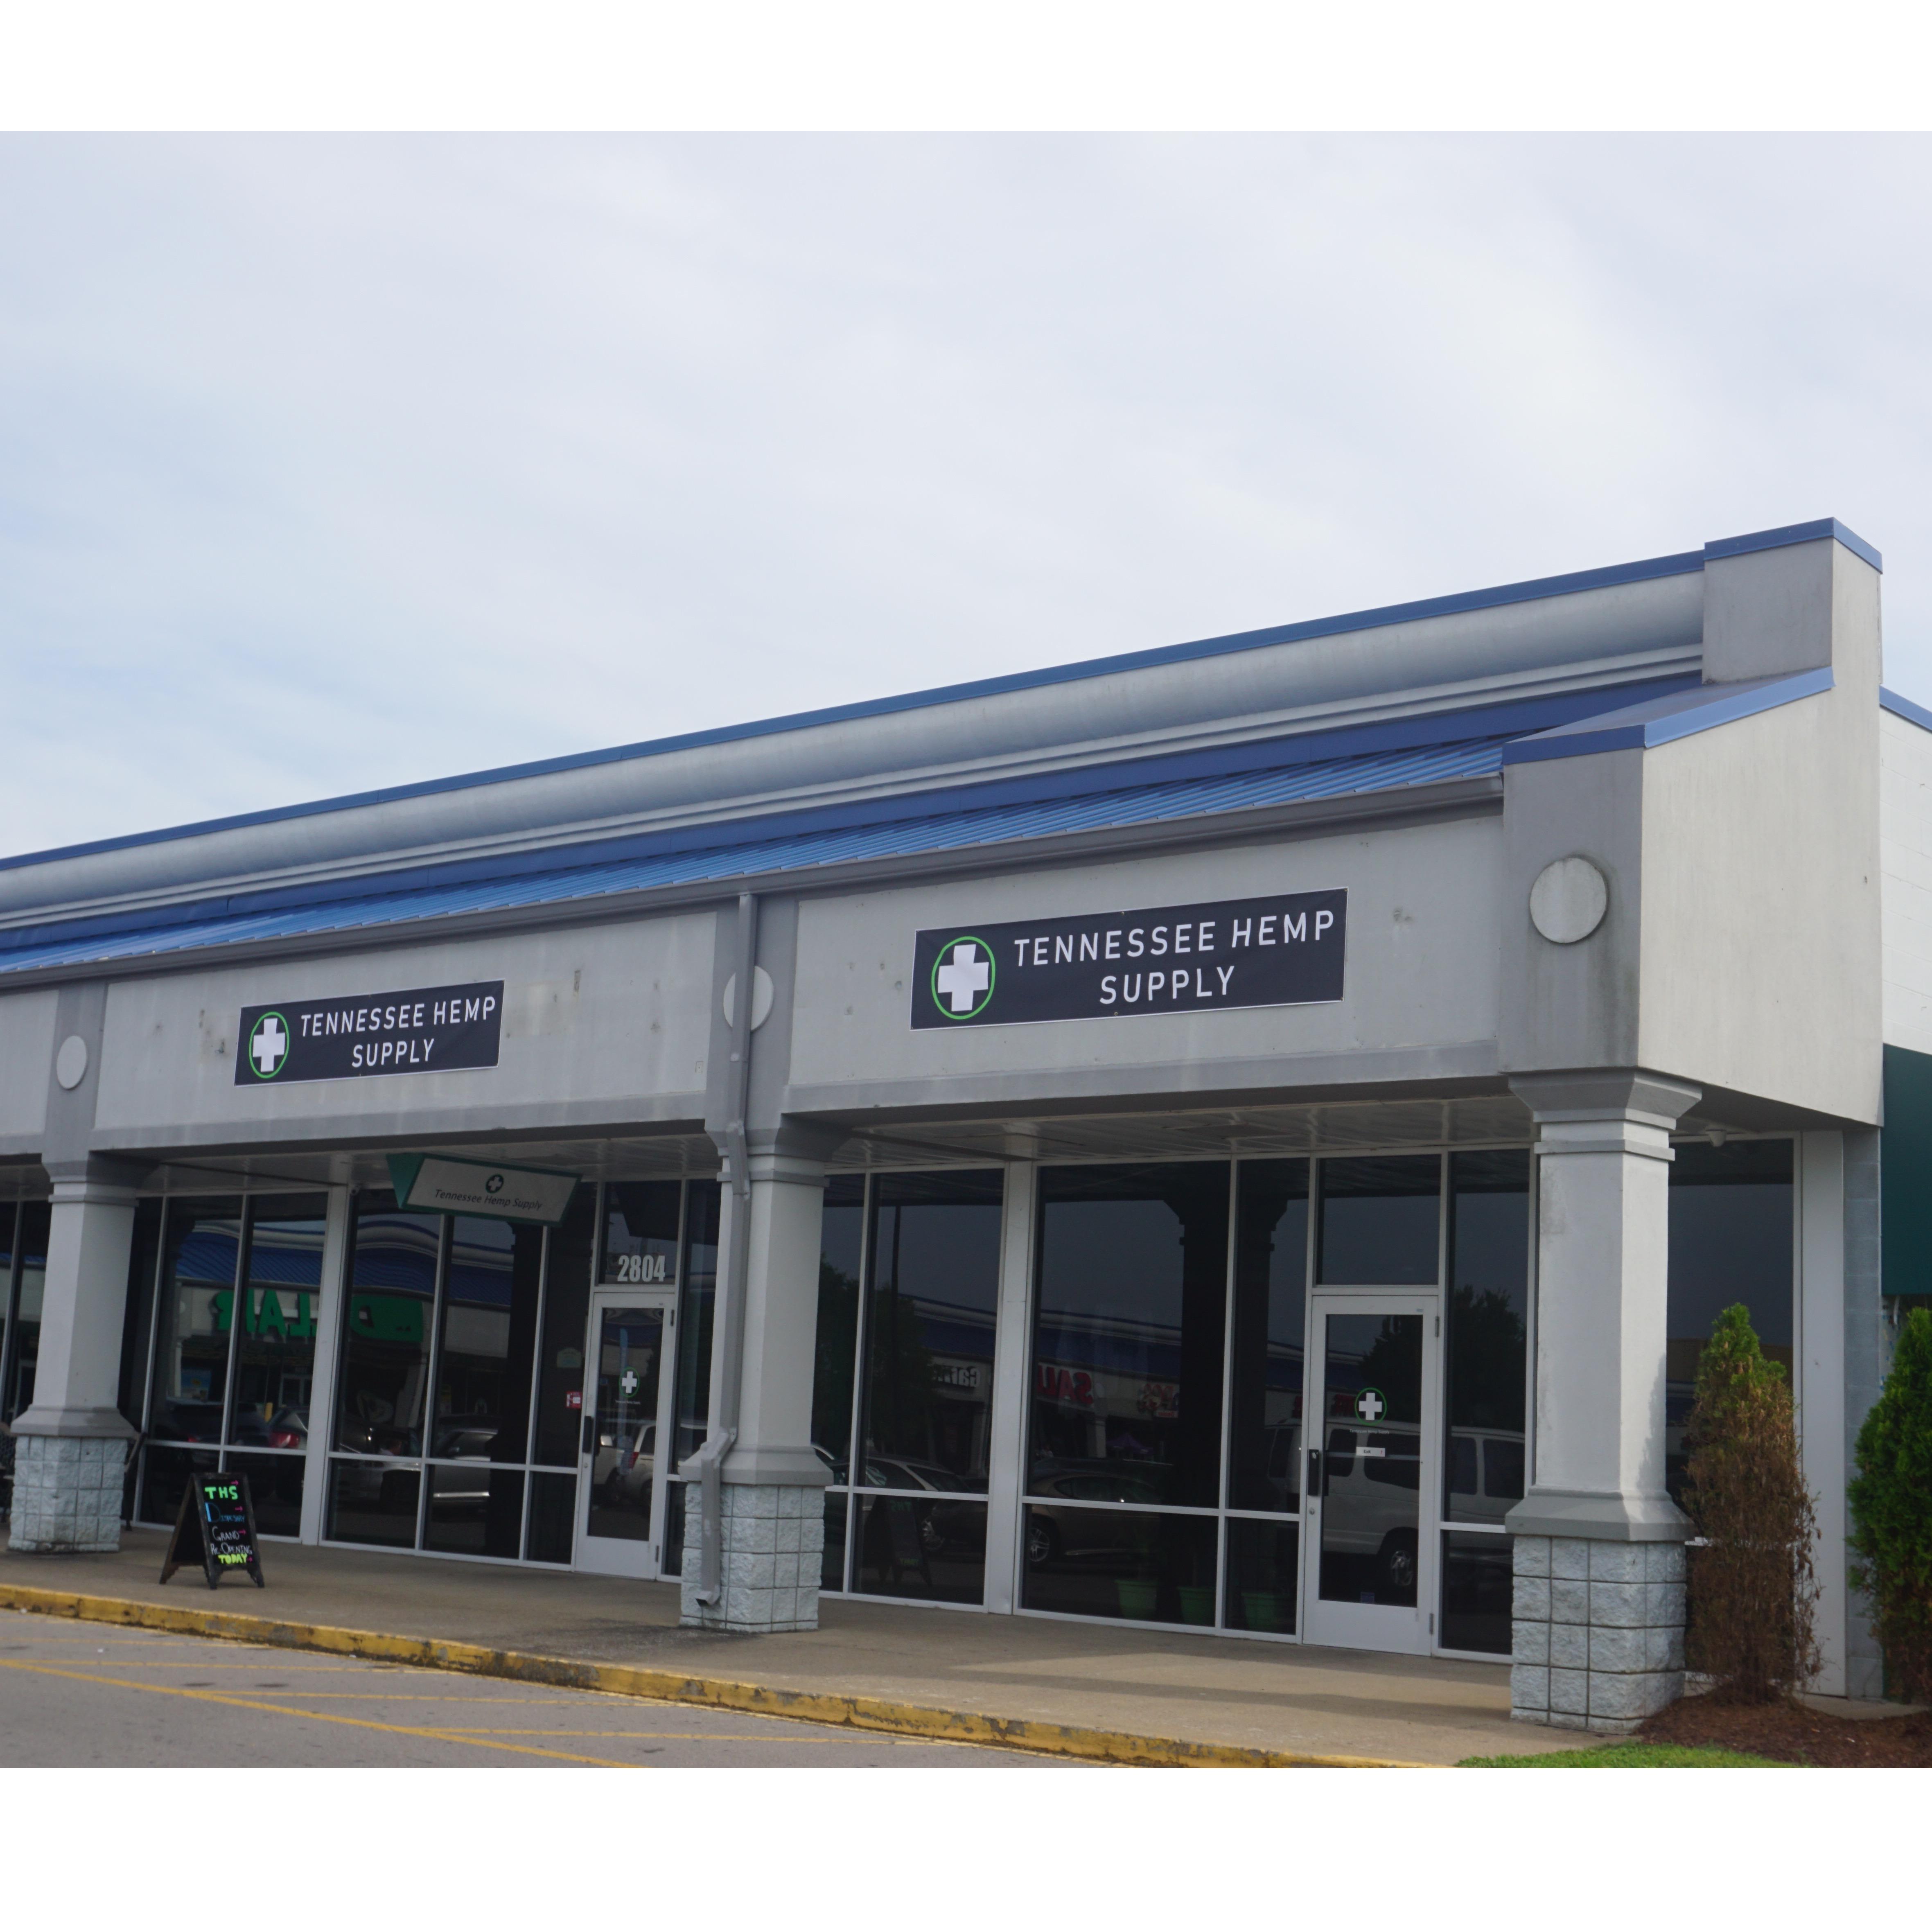 Tennessee Hemp Supply - Murfreesboro, TN - Alternative Medicine